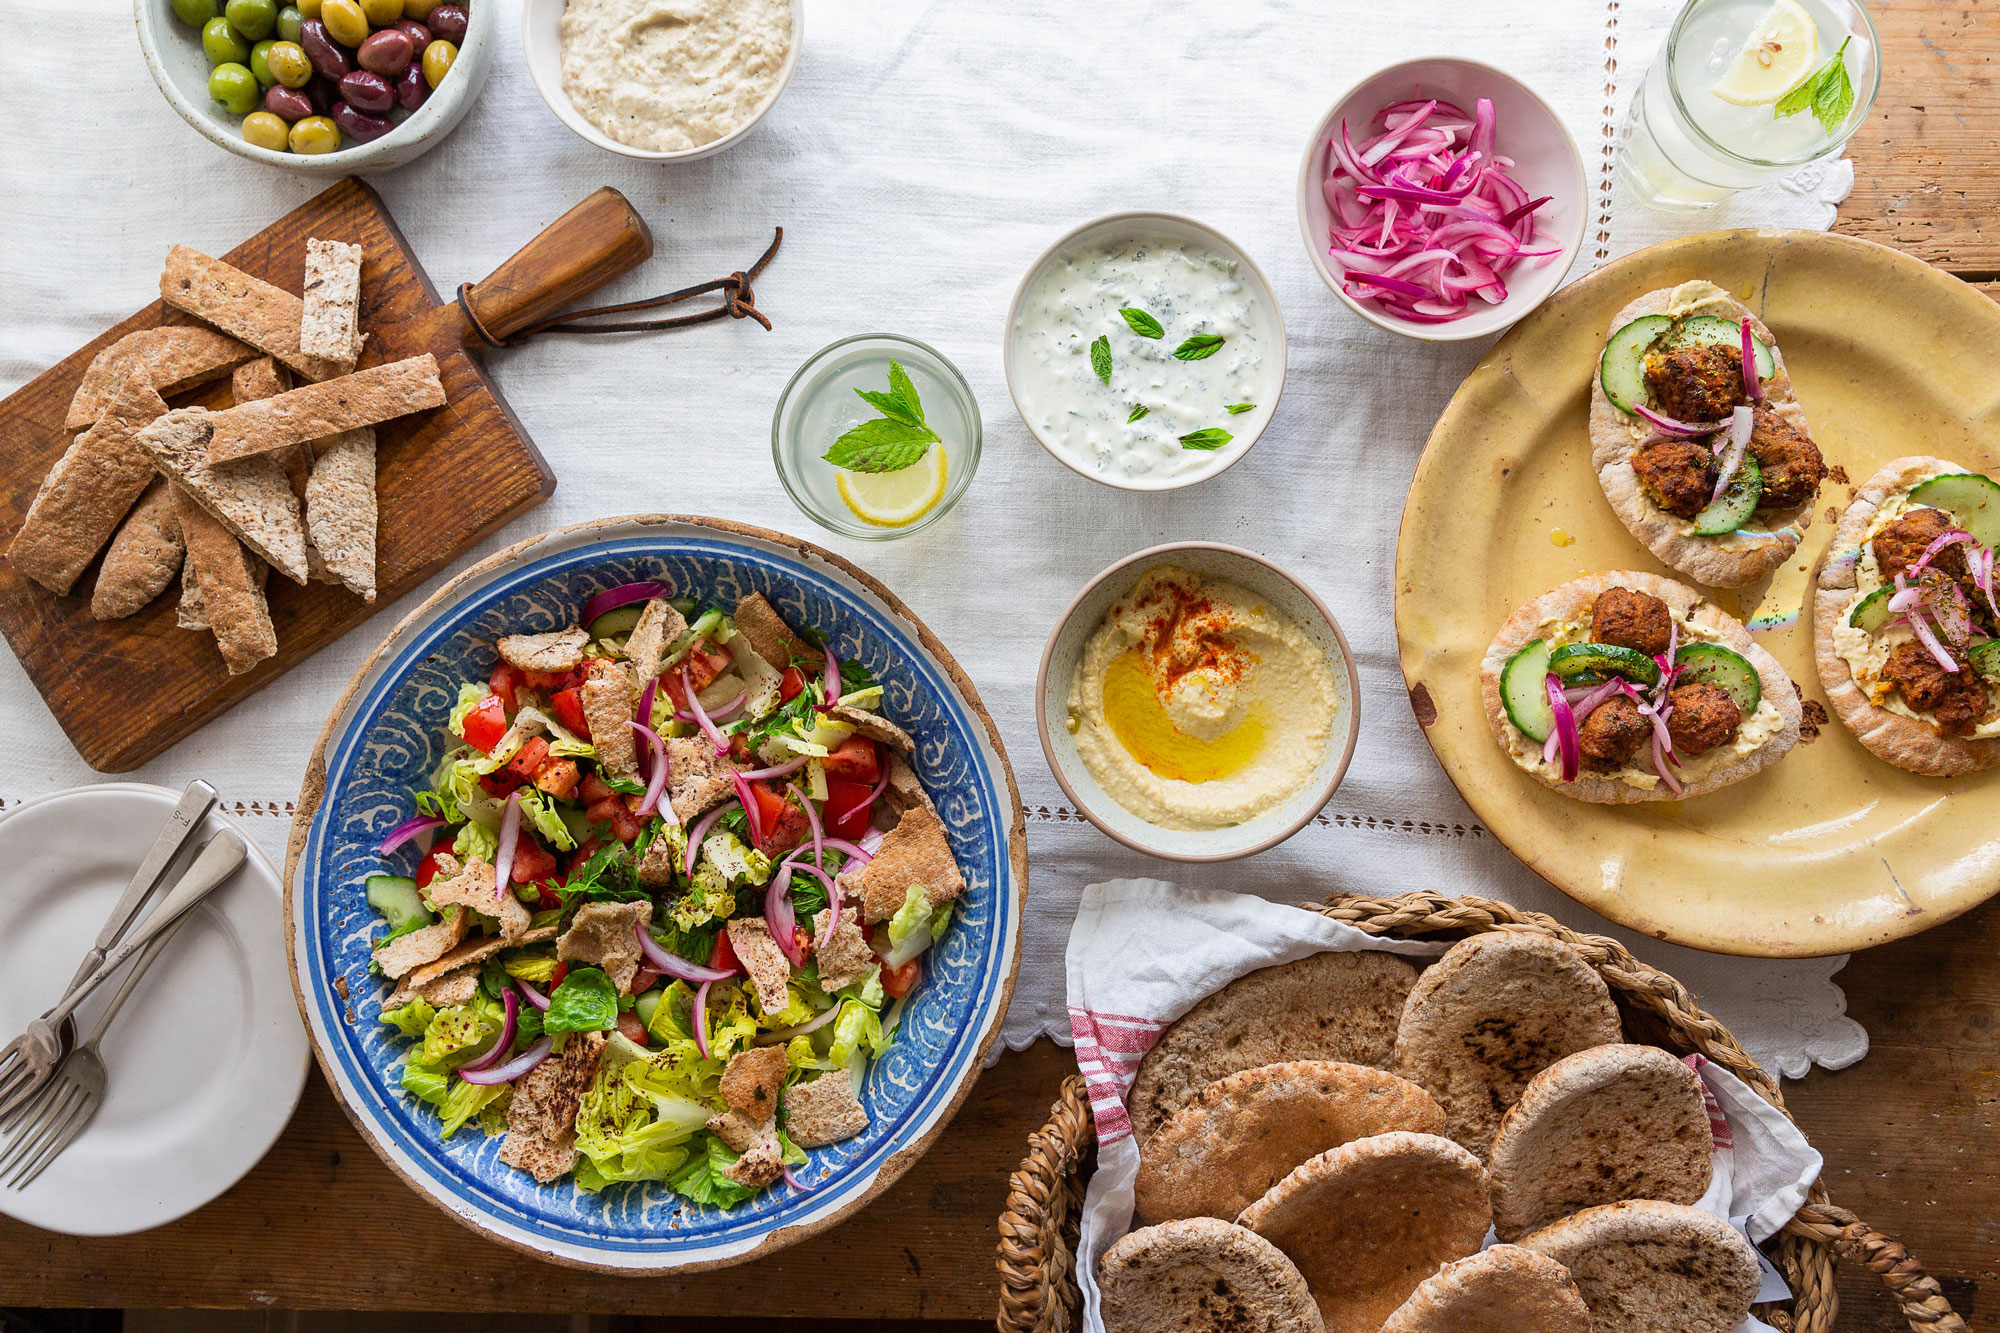 Launching Dina Foods' new Tasty Goodness® range